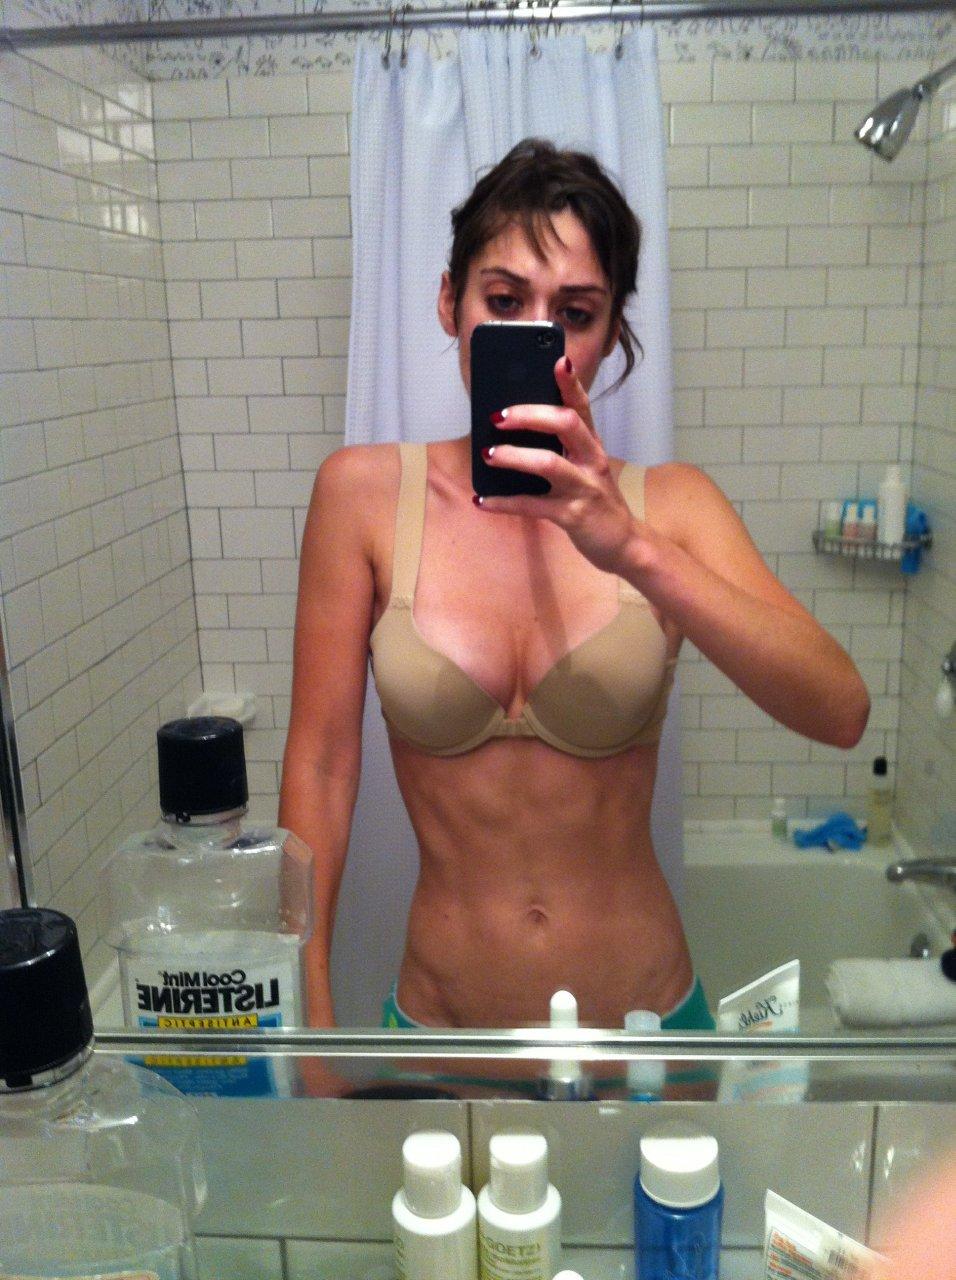 Filtraciones de icloud desnudas amateurs